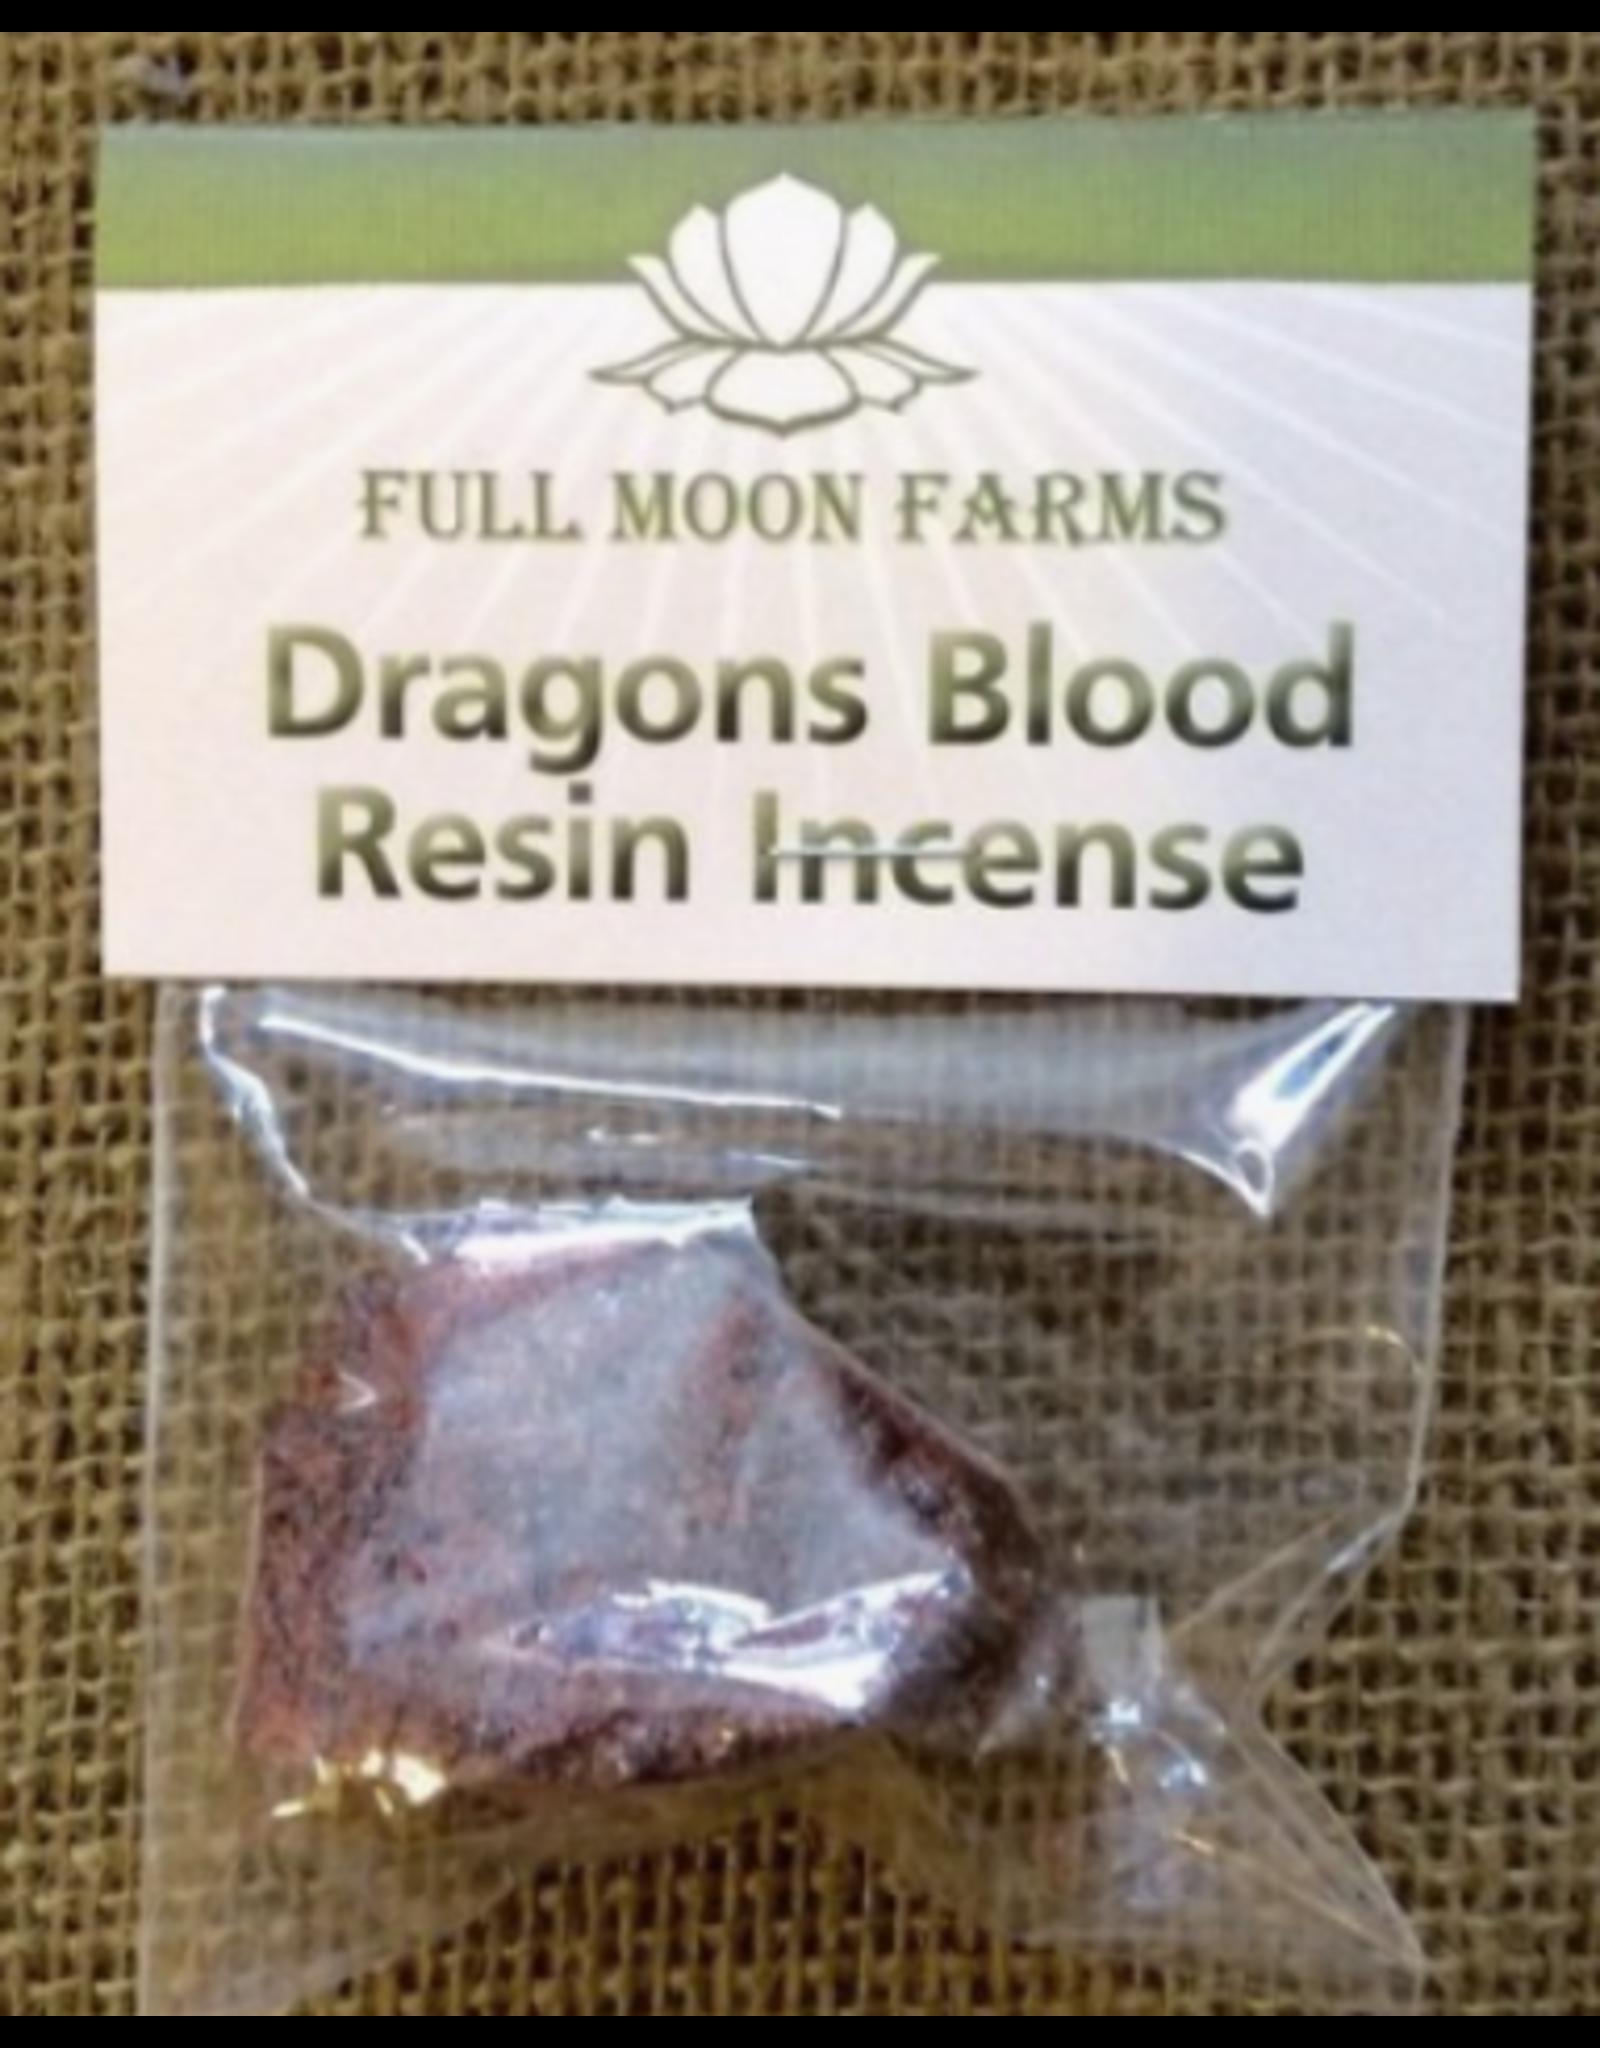 Full Moon Farms Dragons Blood Resin Incense 0.5 oz